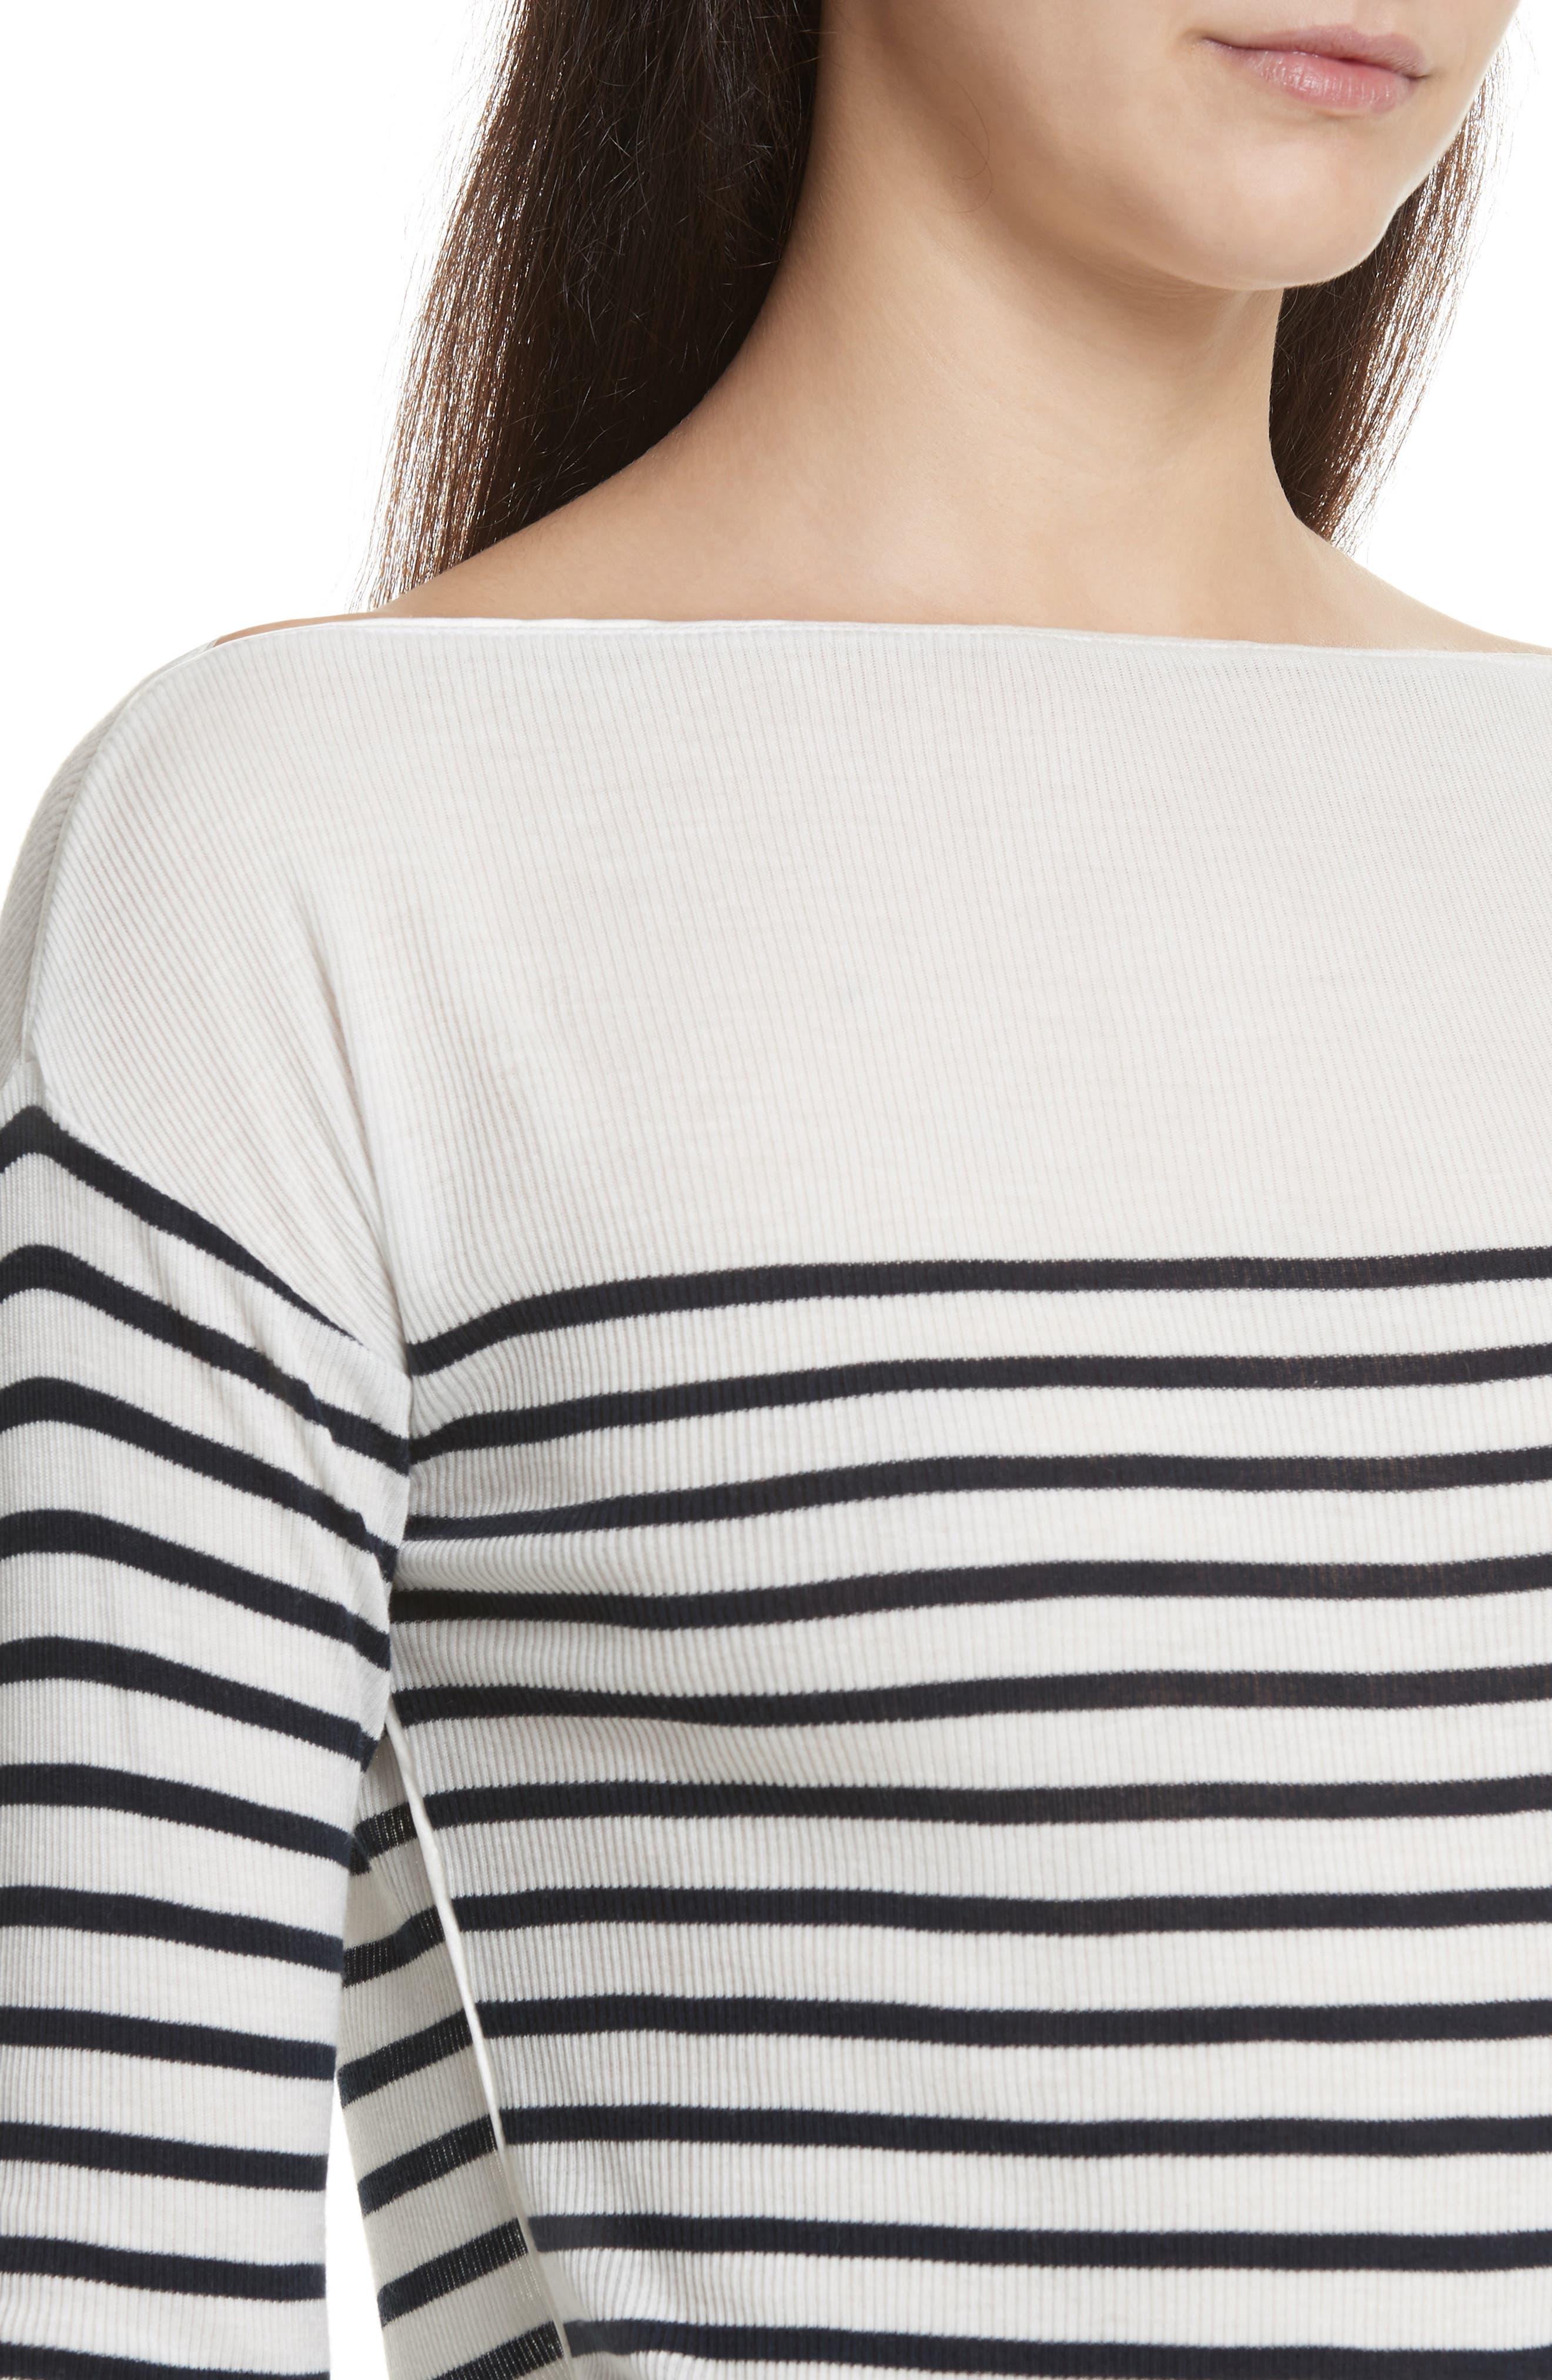 Madison Stripe Long Sleeve Top,                             Alternate thumbnail 4, color,                             Ivory/ Navy